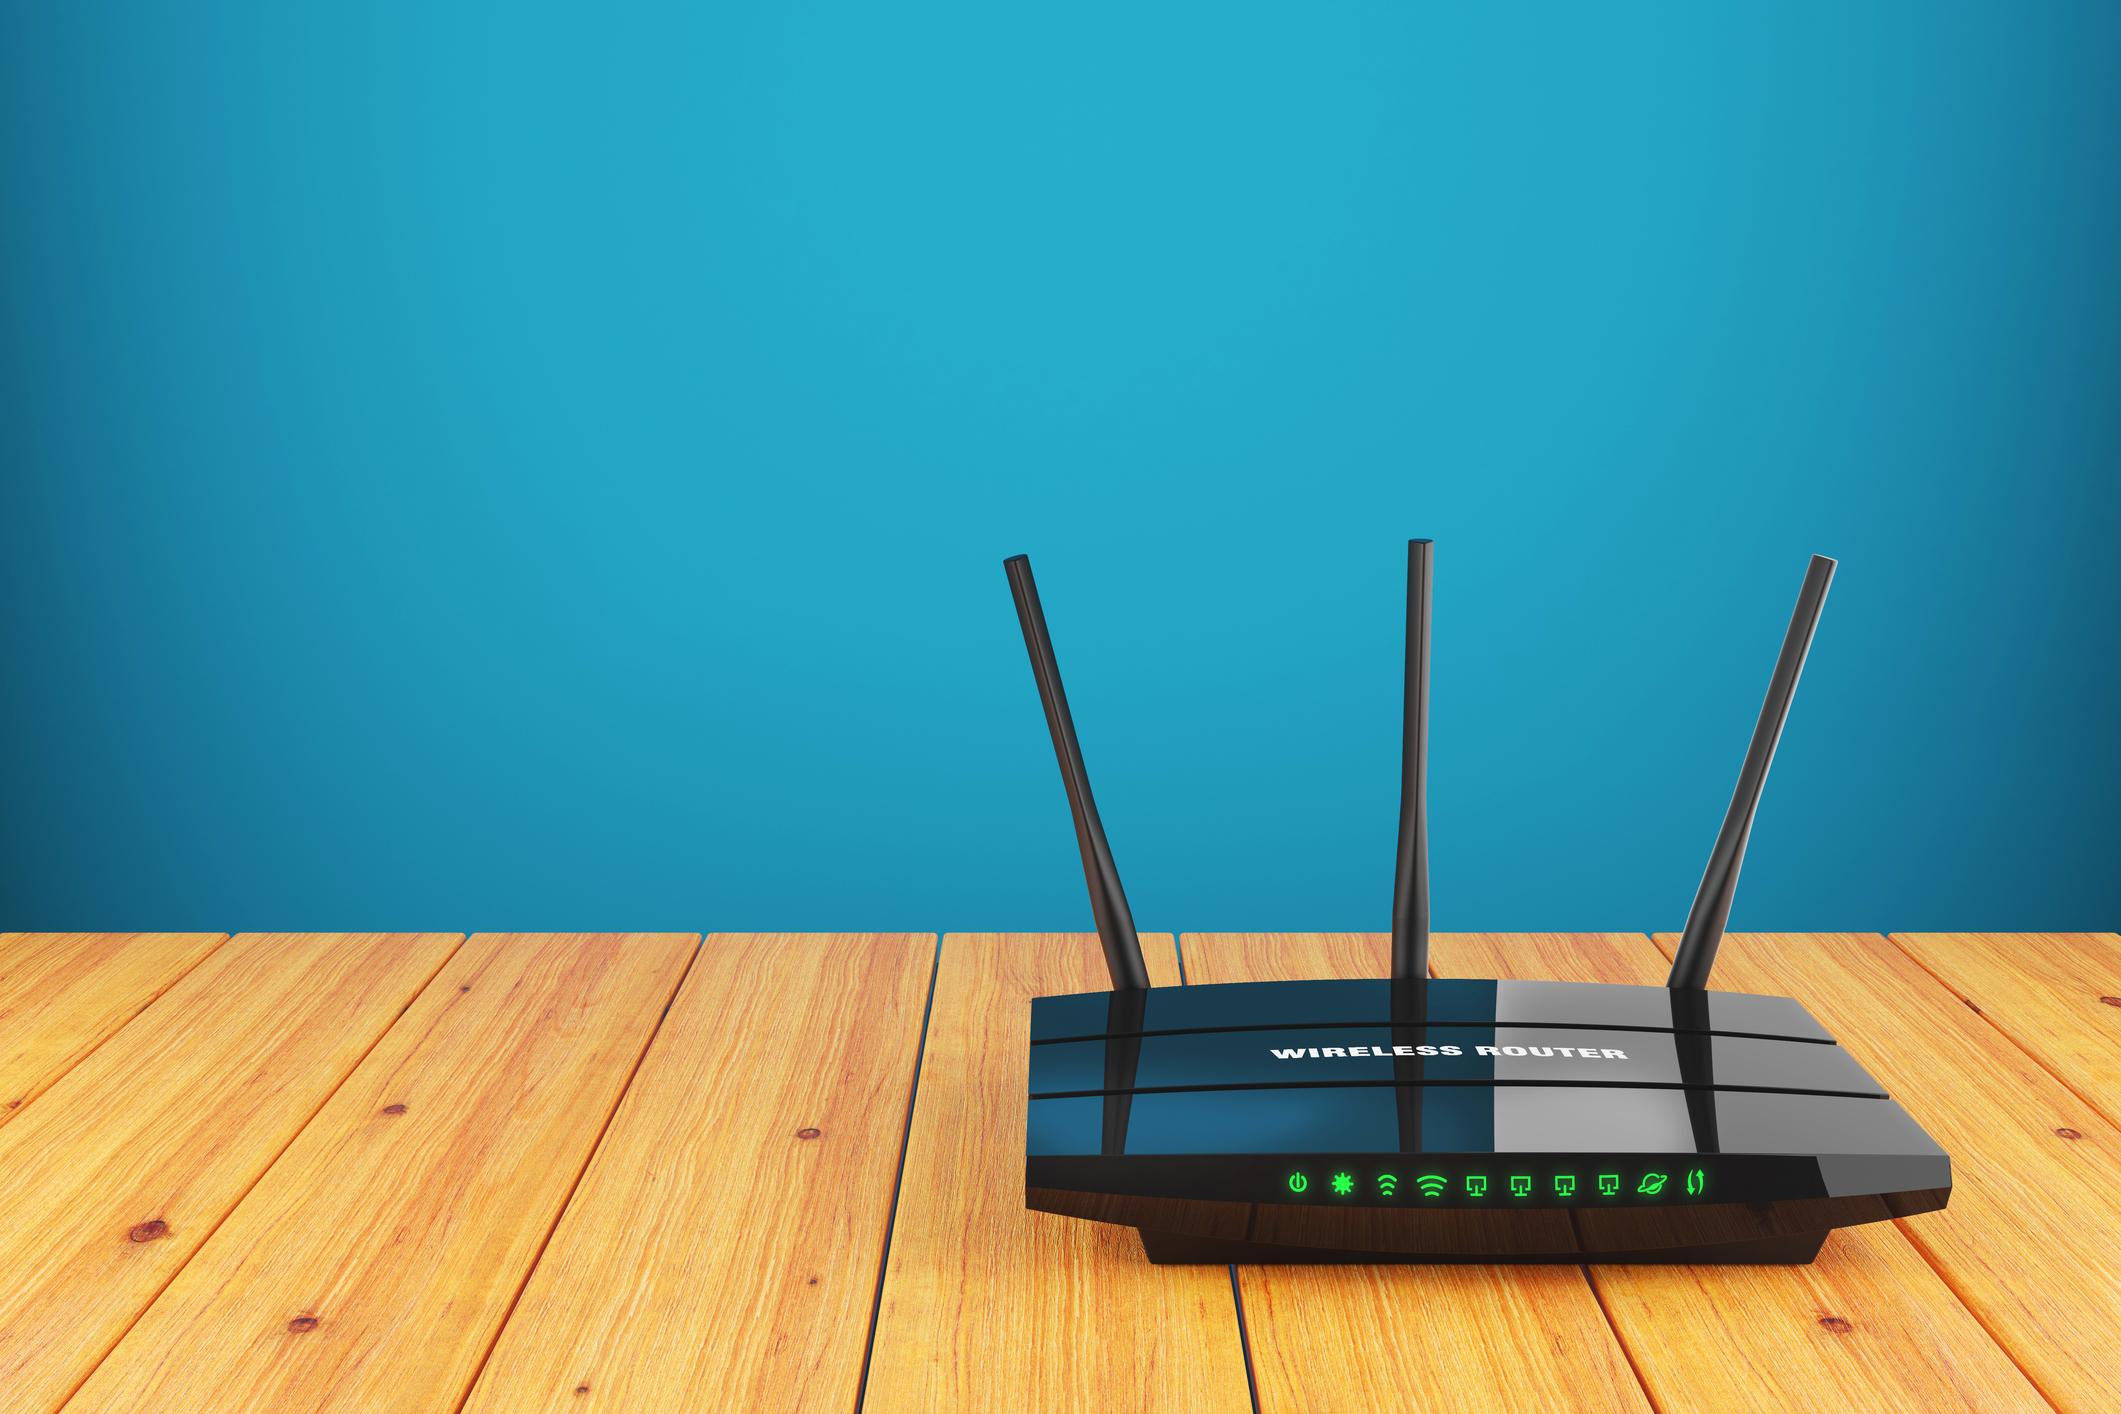 WLAN Router einrichten Anleitung